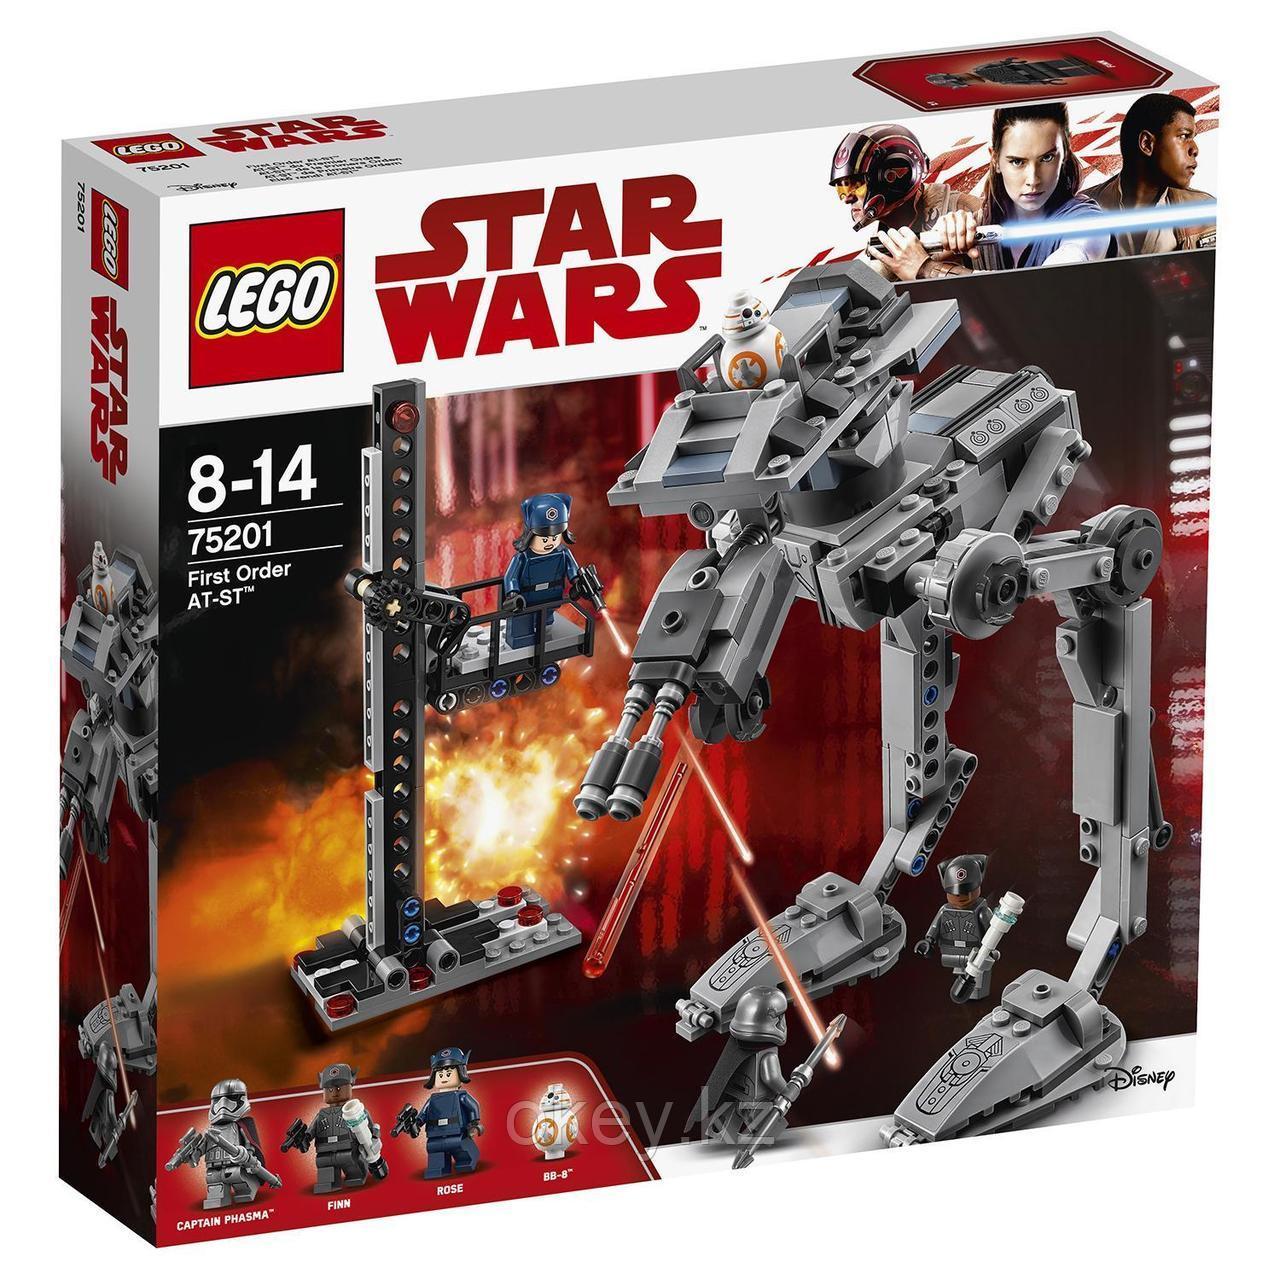 LEGO Star Wars: Вездеход AT-ST Первого Ордена 75201